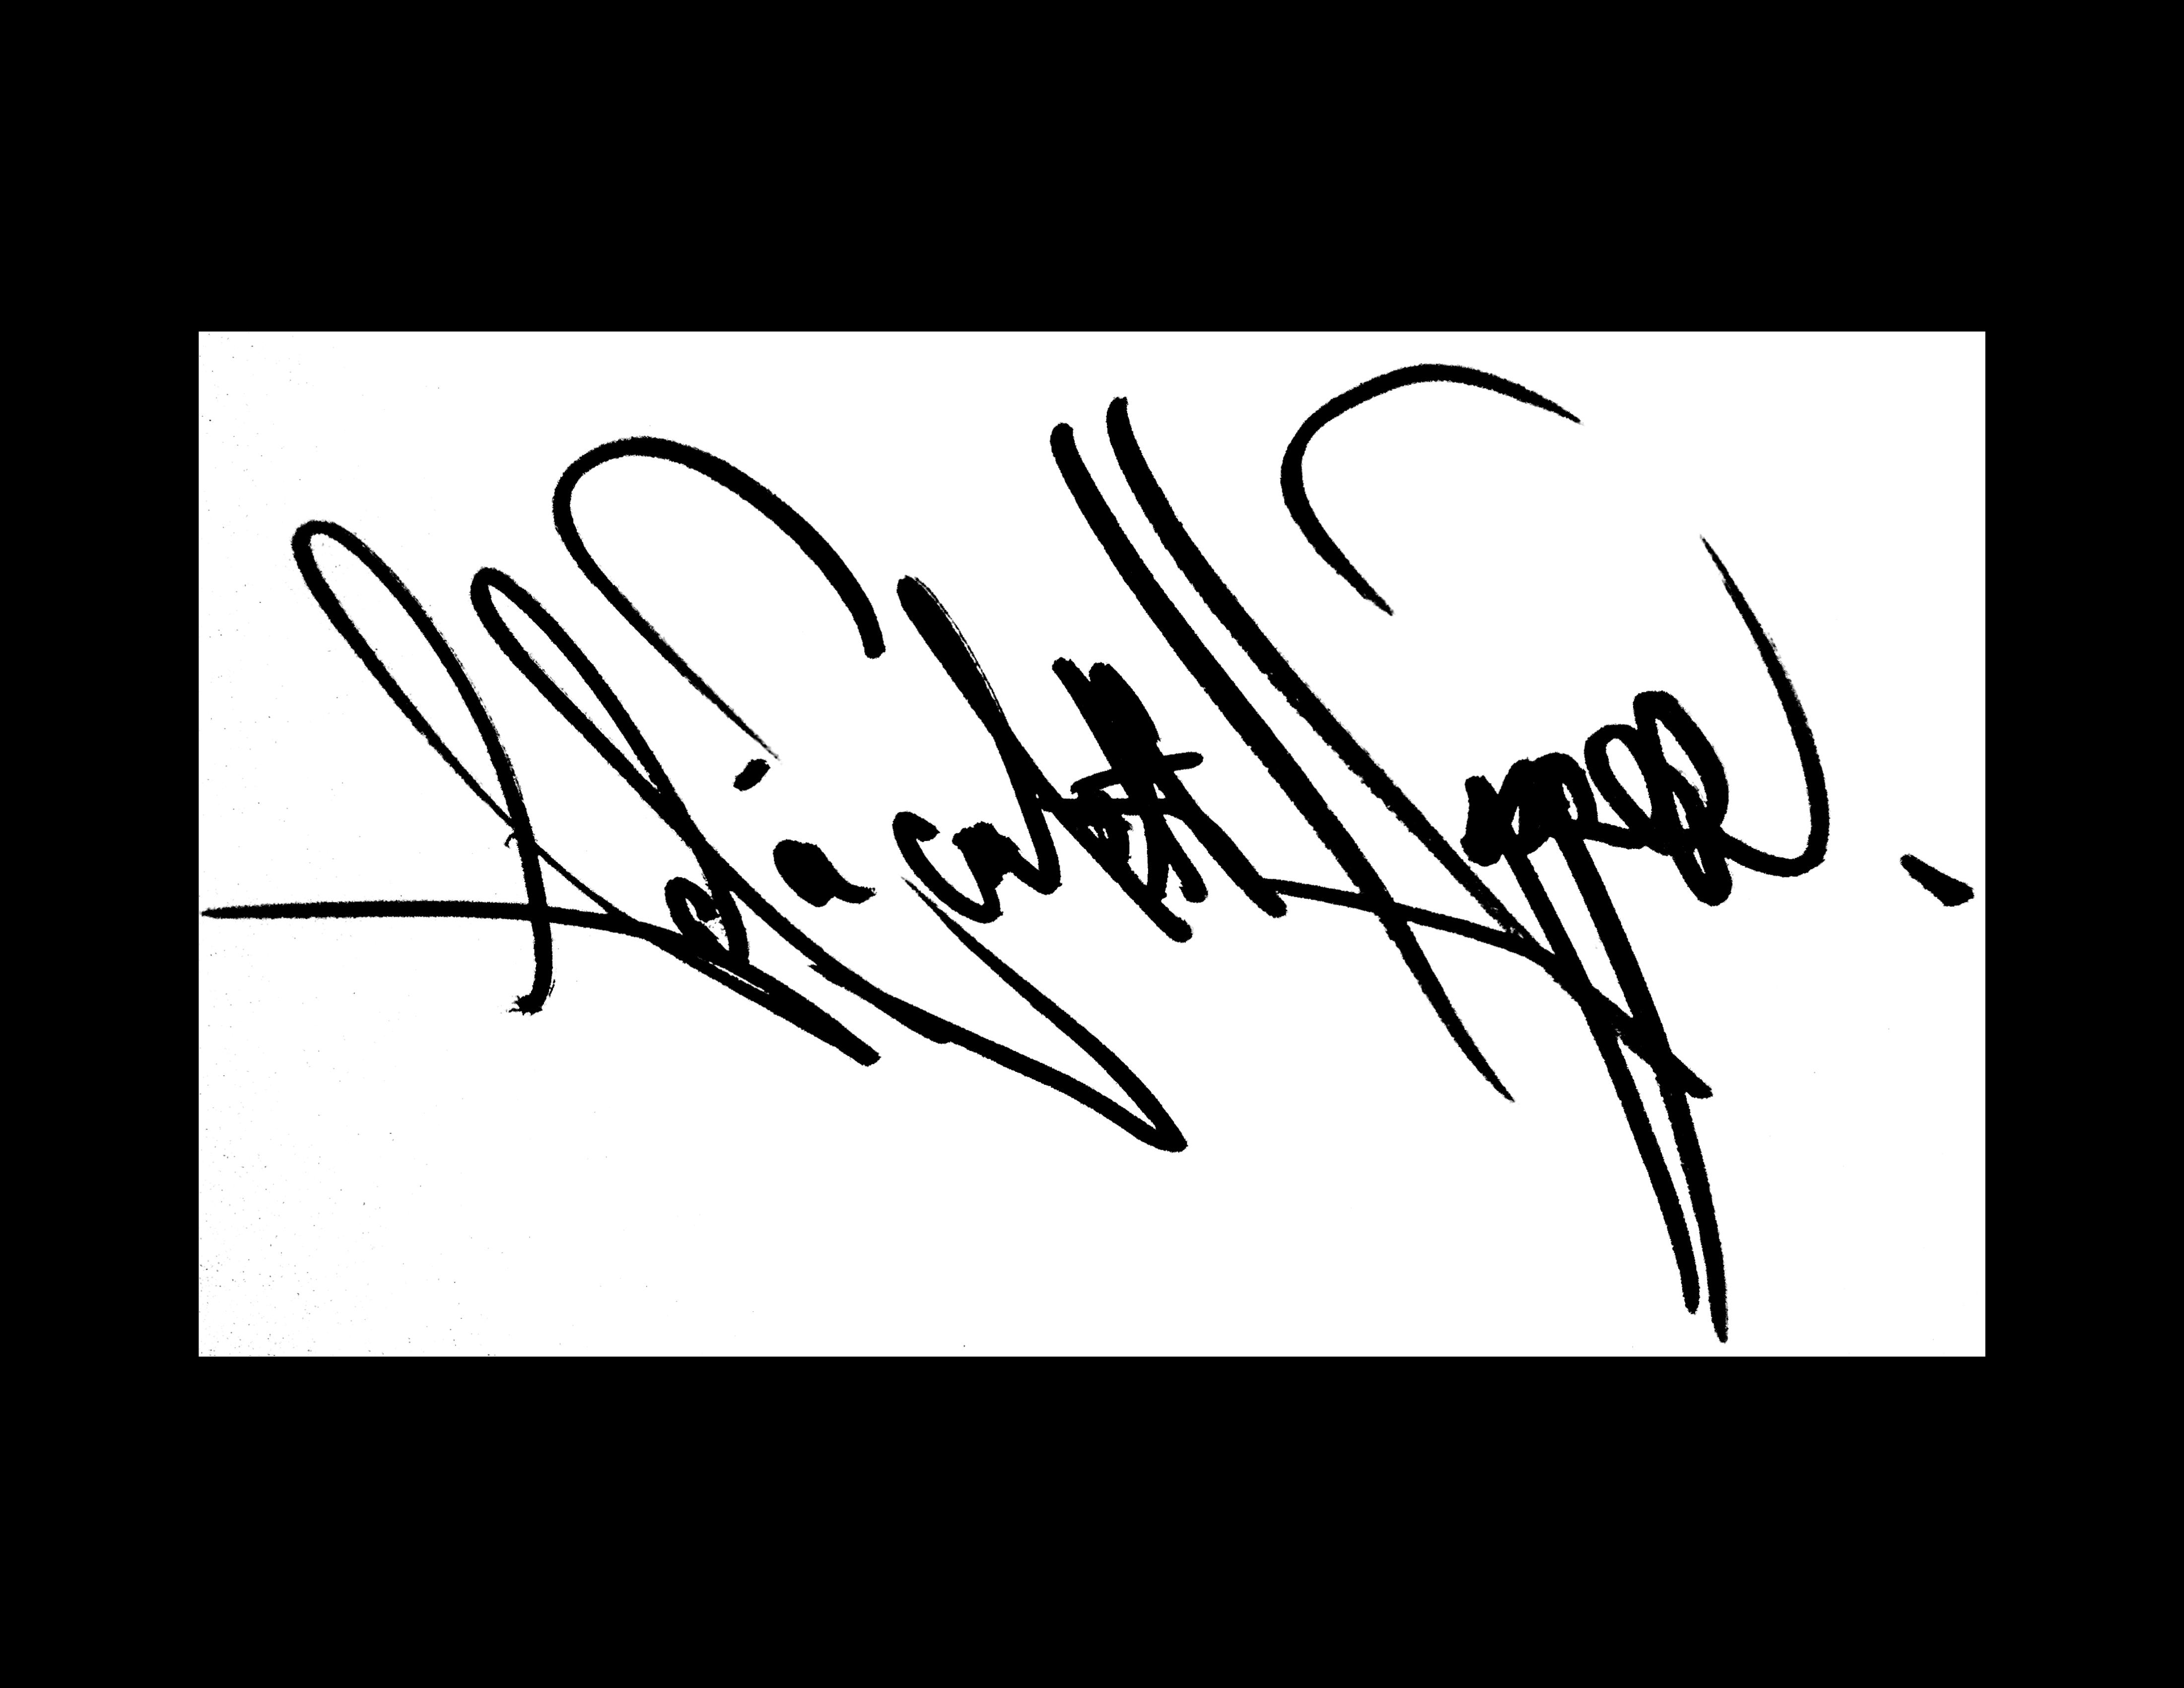 ada-scarlett hopper's Signature